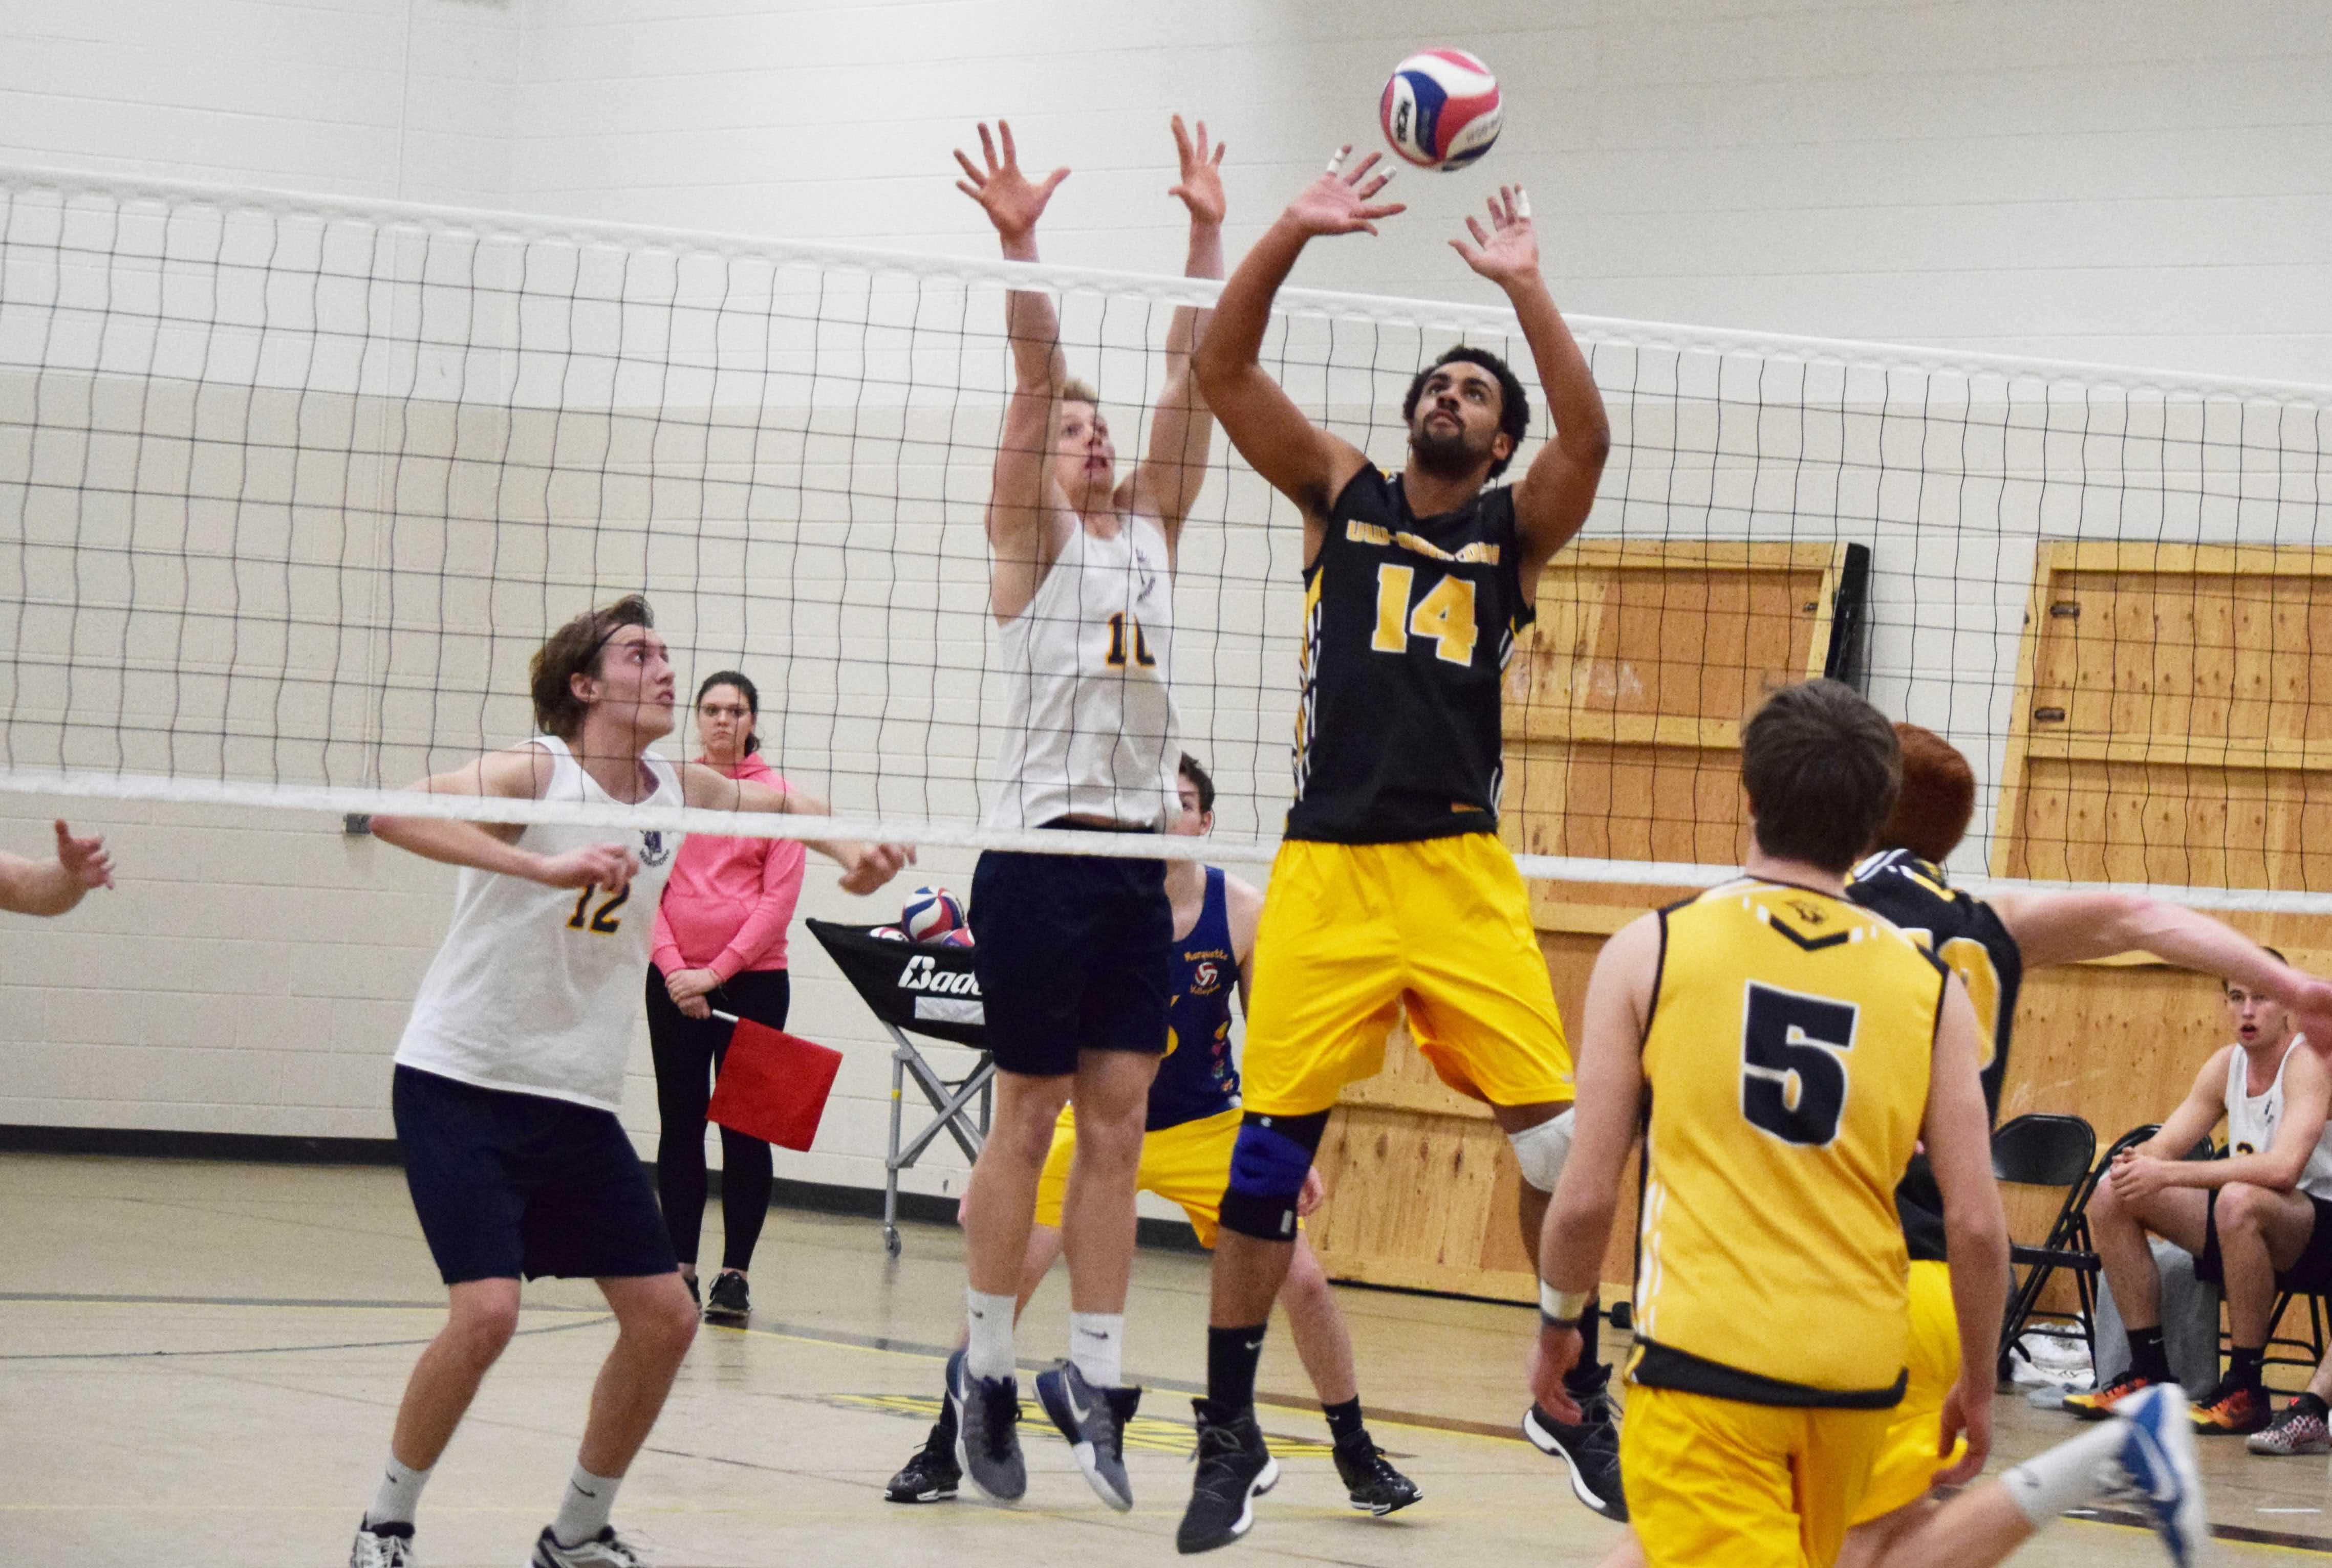 Men's volleyball sweeps La Crosse Eagles